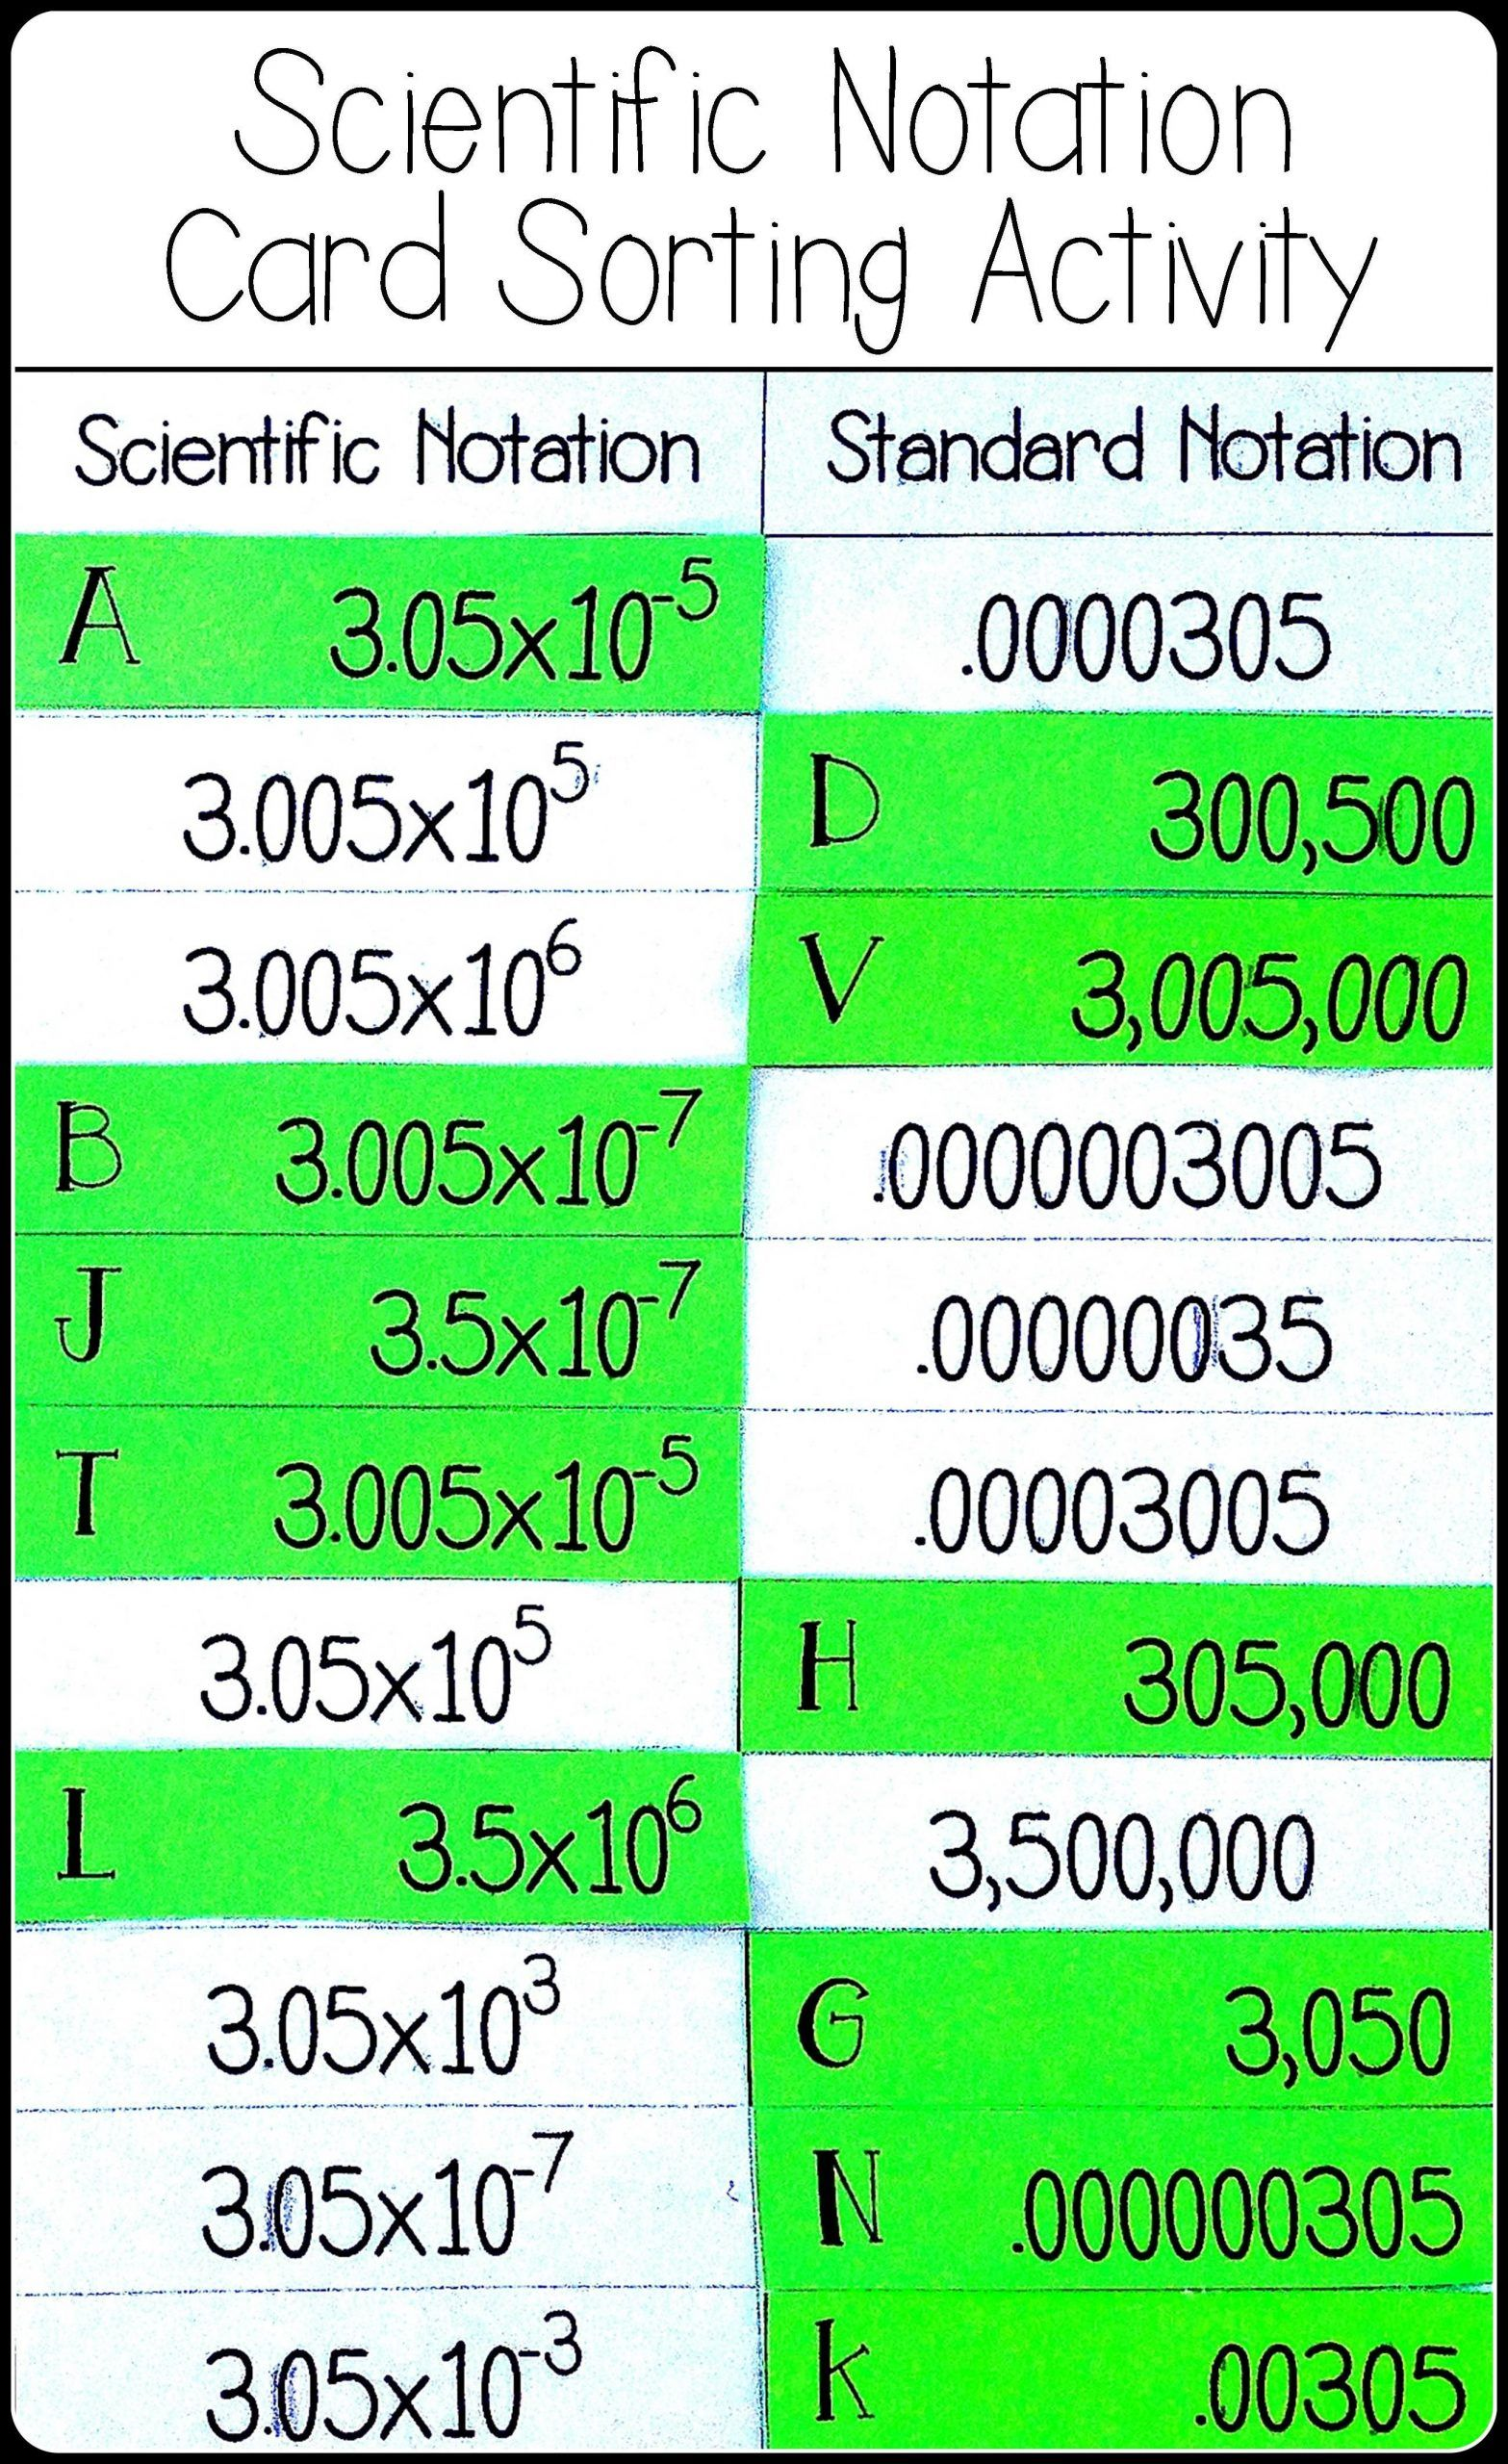 Scientific Notation Worksheet Answer Key Scientific Notation Card Sort Activity Scientific Notation Activities Scientific Notation Scientific Notation Practice